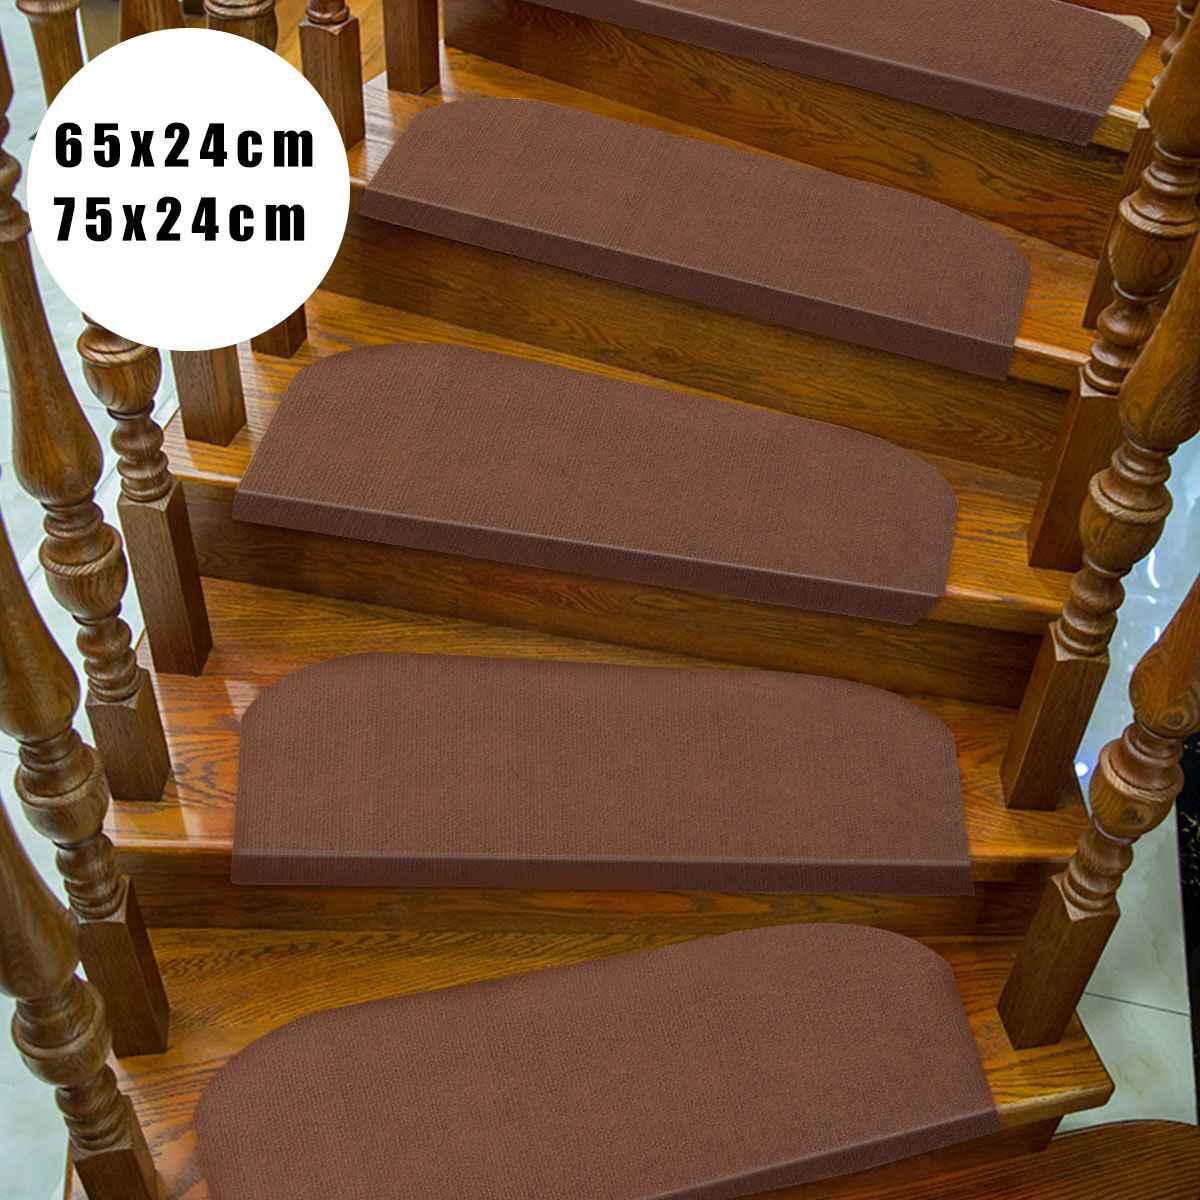 Kiwarm 1Pcs Brown Non Slip Carpet Stair Treads Mats Staircase Step | Padded Carpet Stair Treads | True Bullnose Carpet | Carpet Runners | Staircase Makeover | Dog Cat Pet | Stair Risers